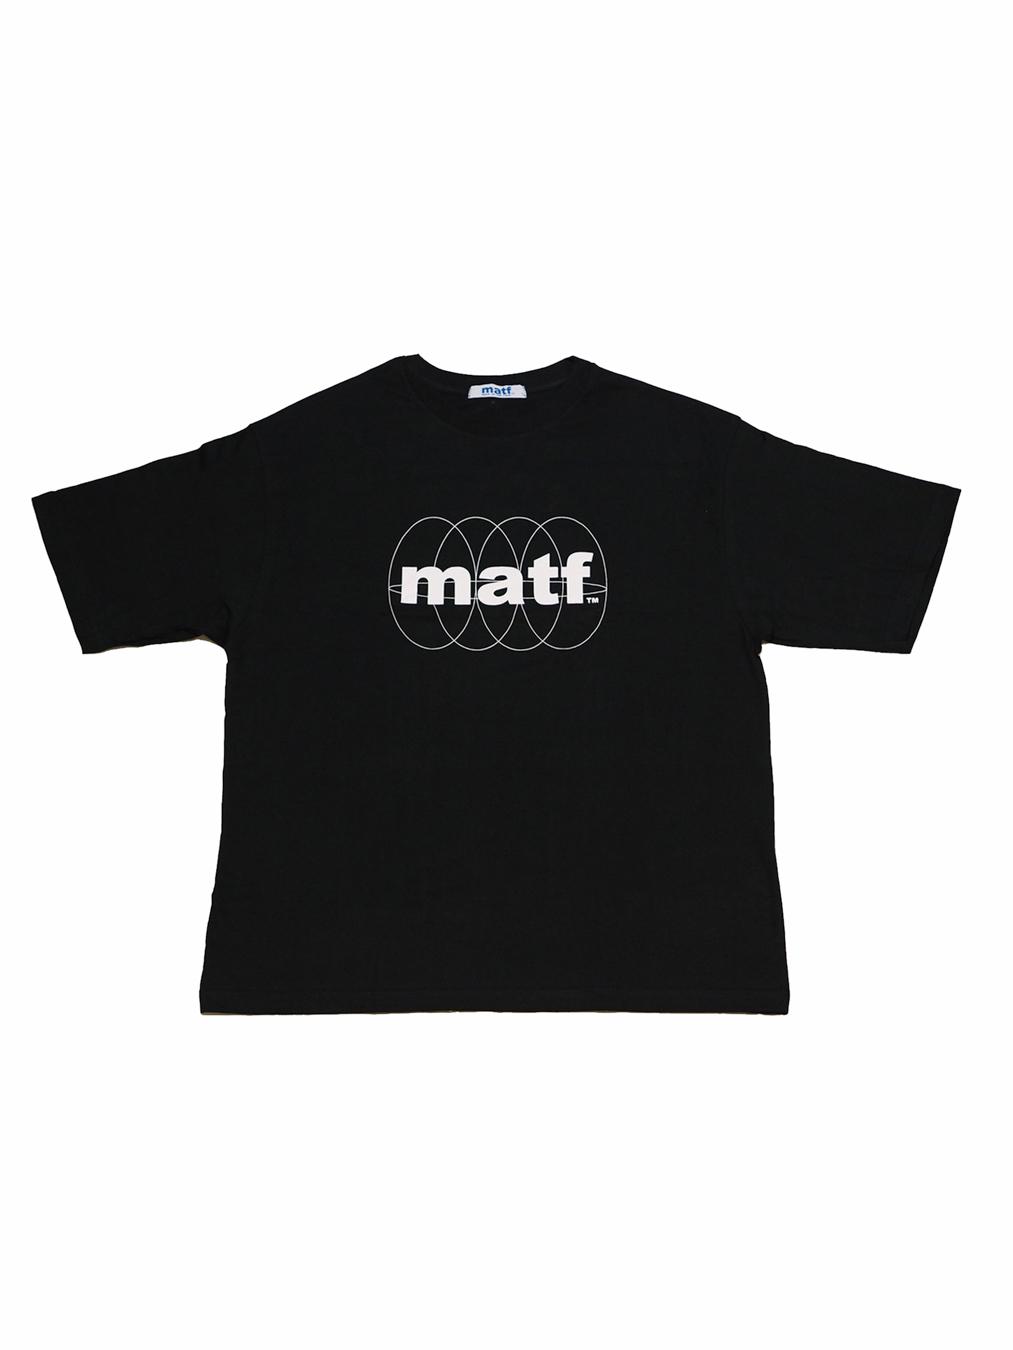 Matf Trademark *Logo* T-Shirt (Black)